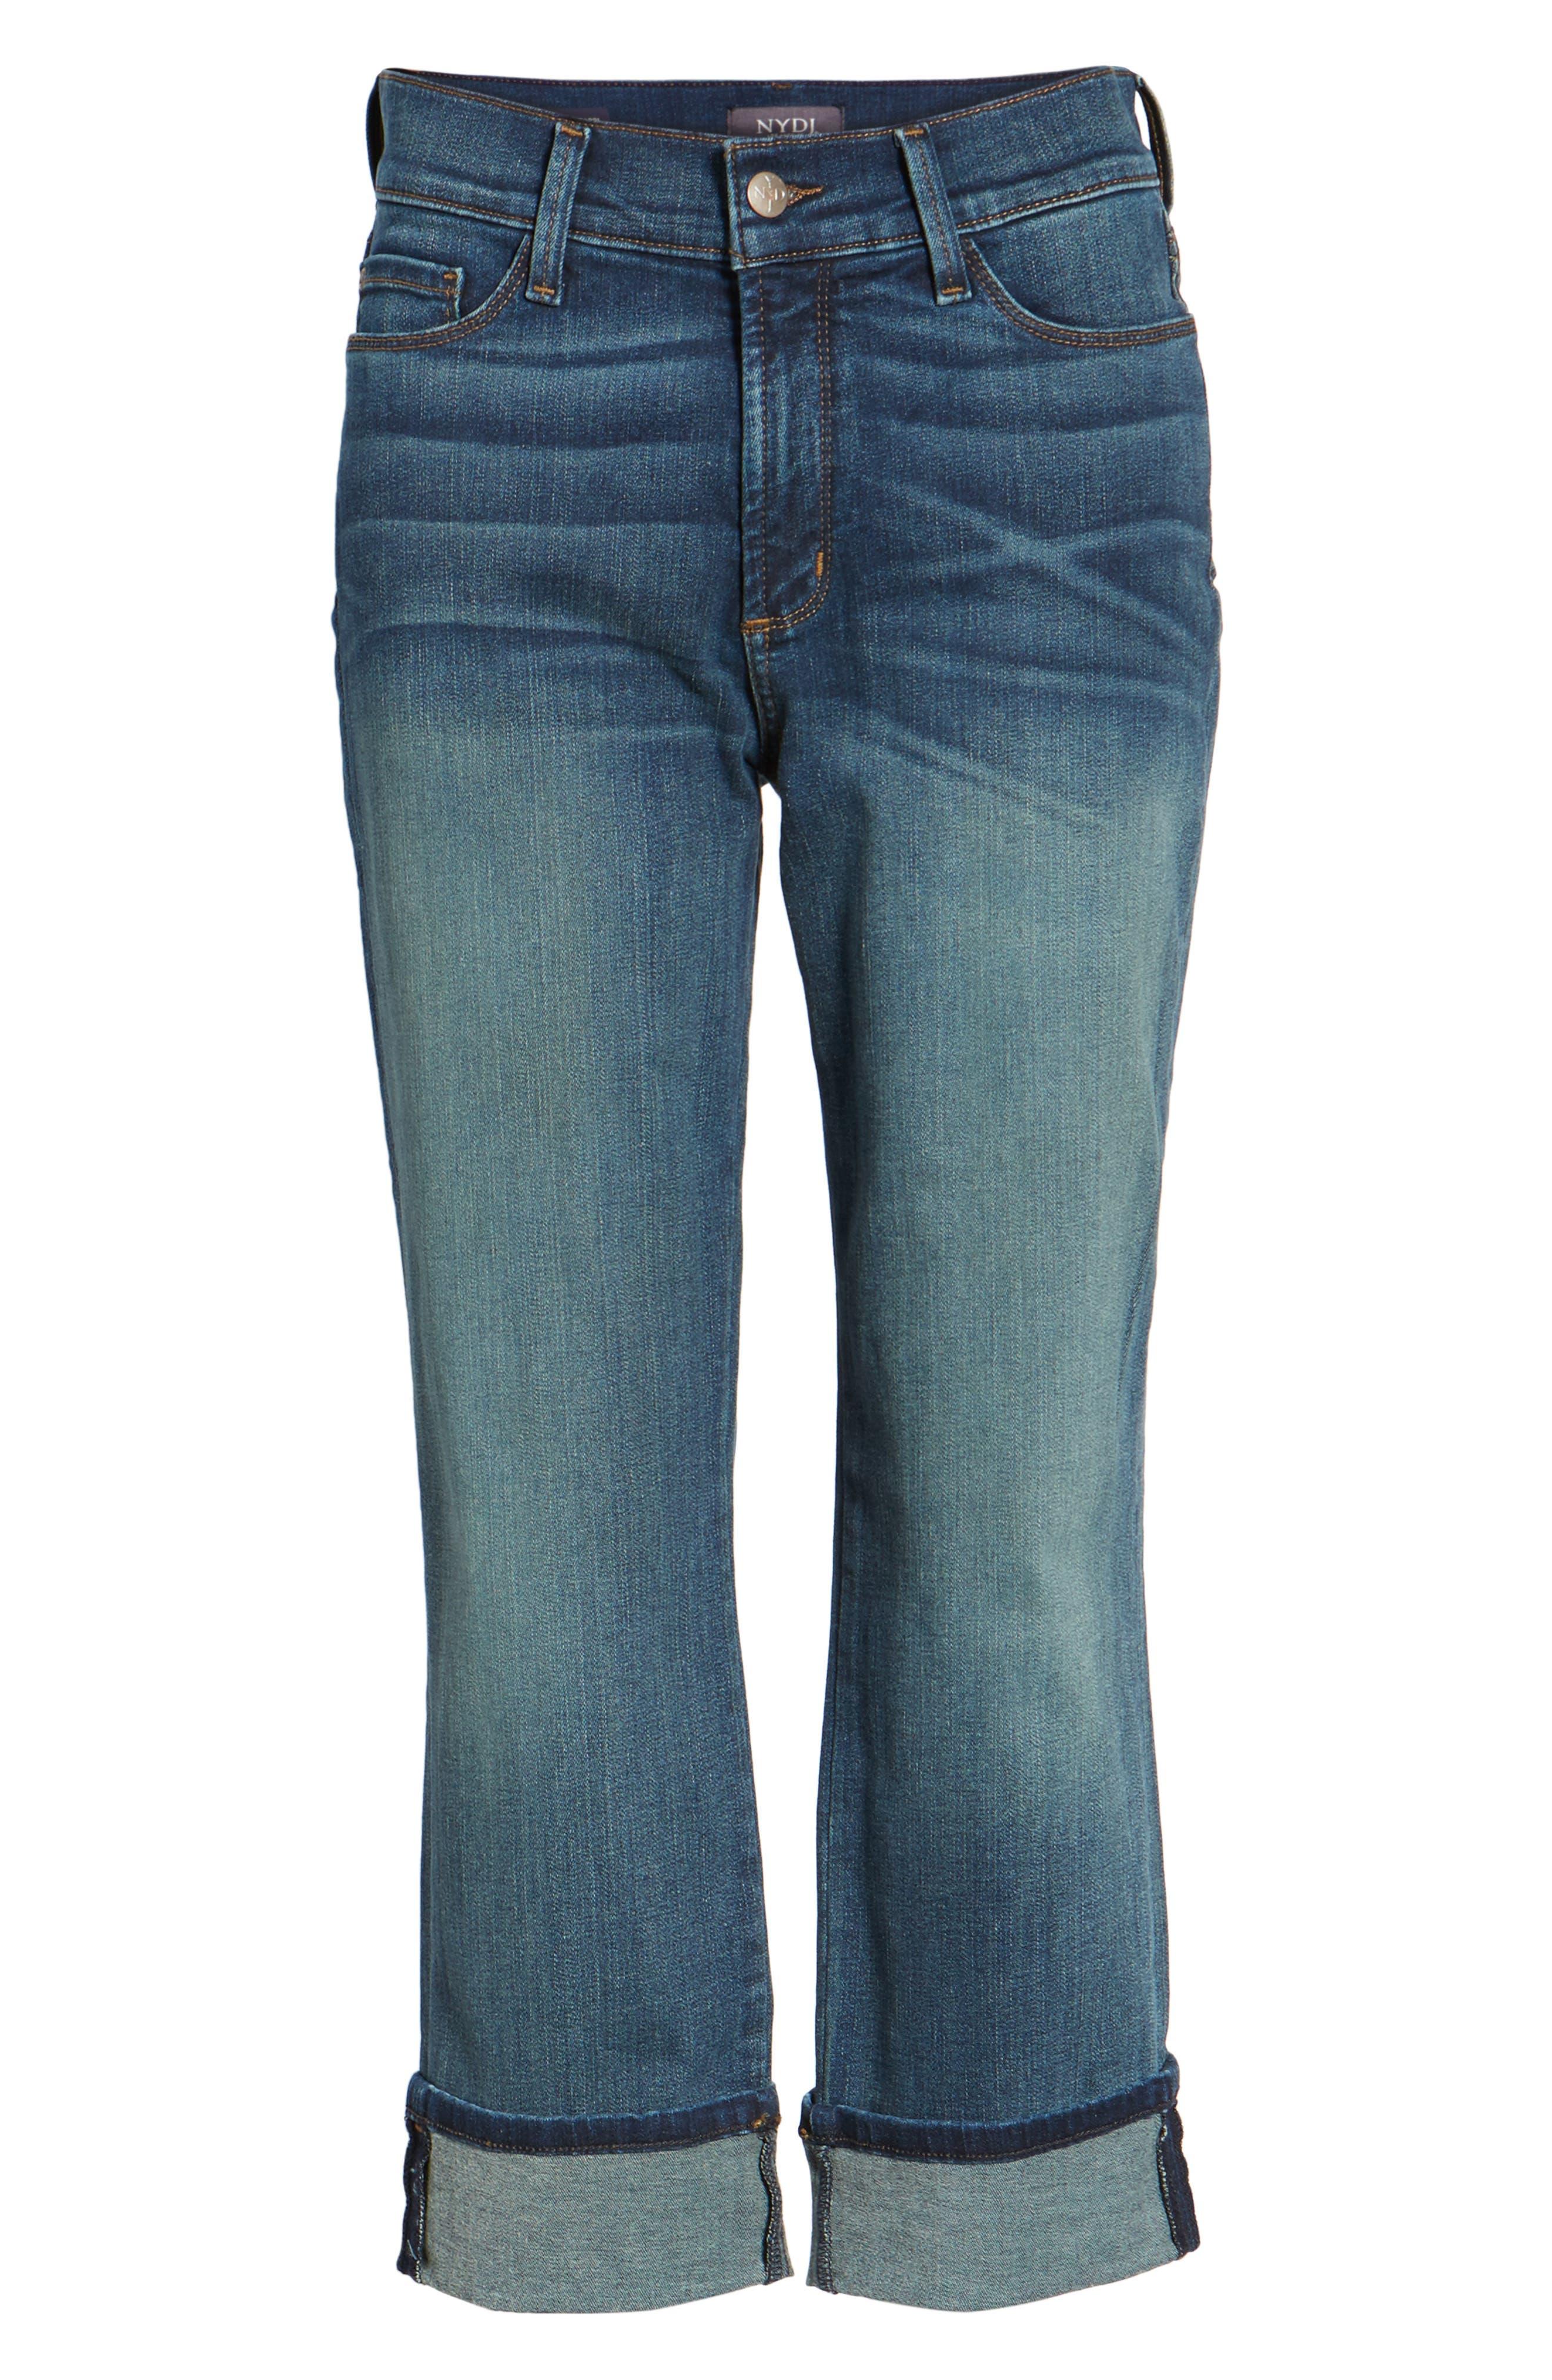 'Dayla' Colored Wide Cuff Capri Jeans,                             Alternate thumbnail 81, color,